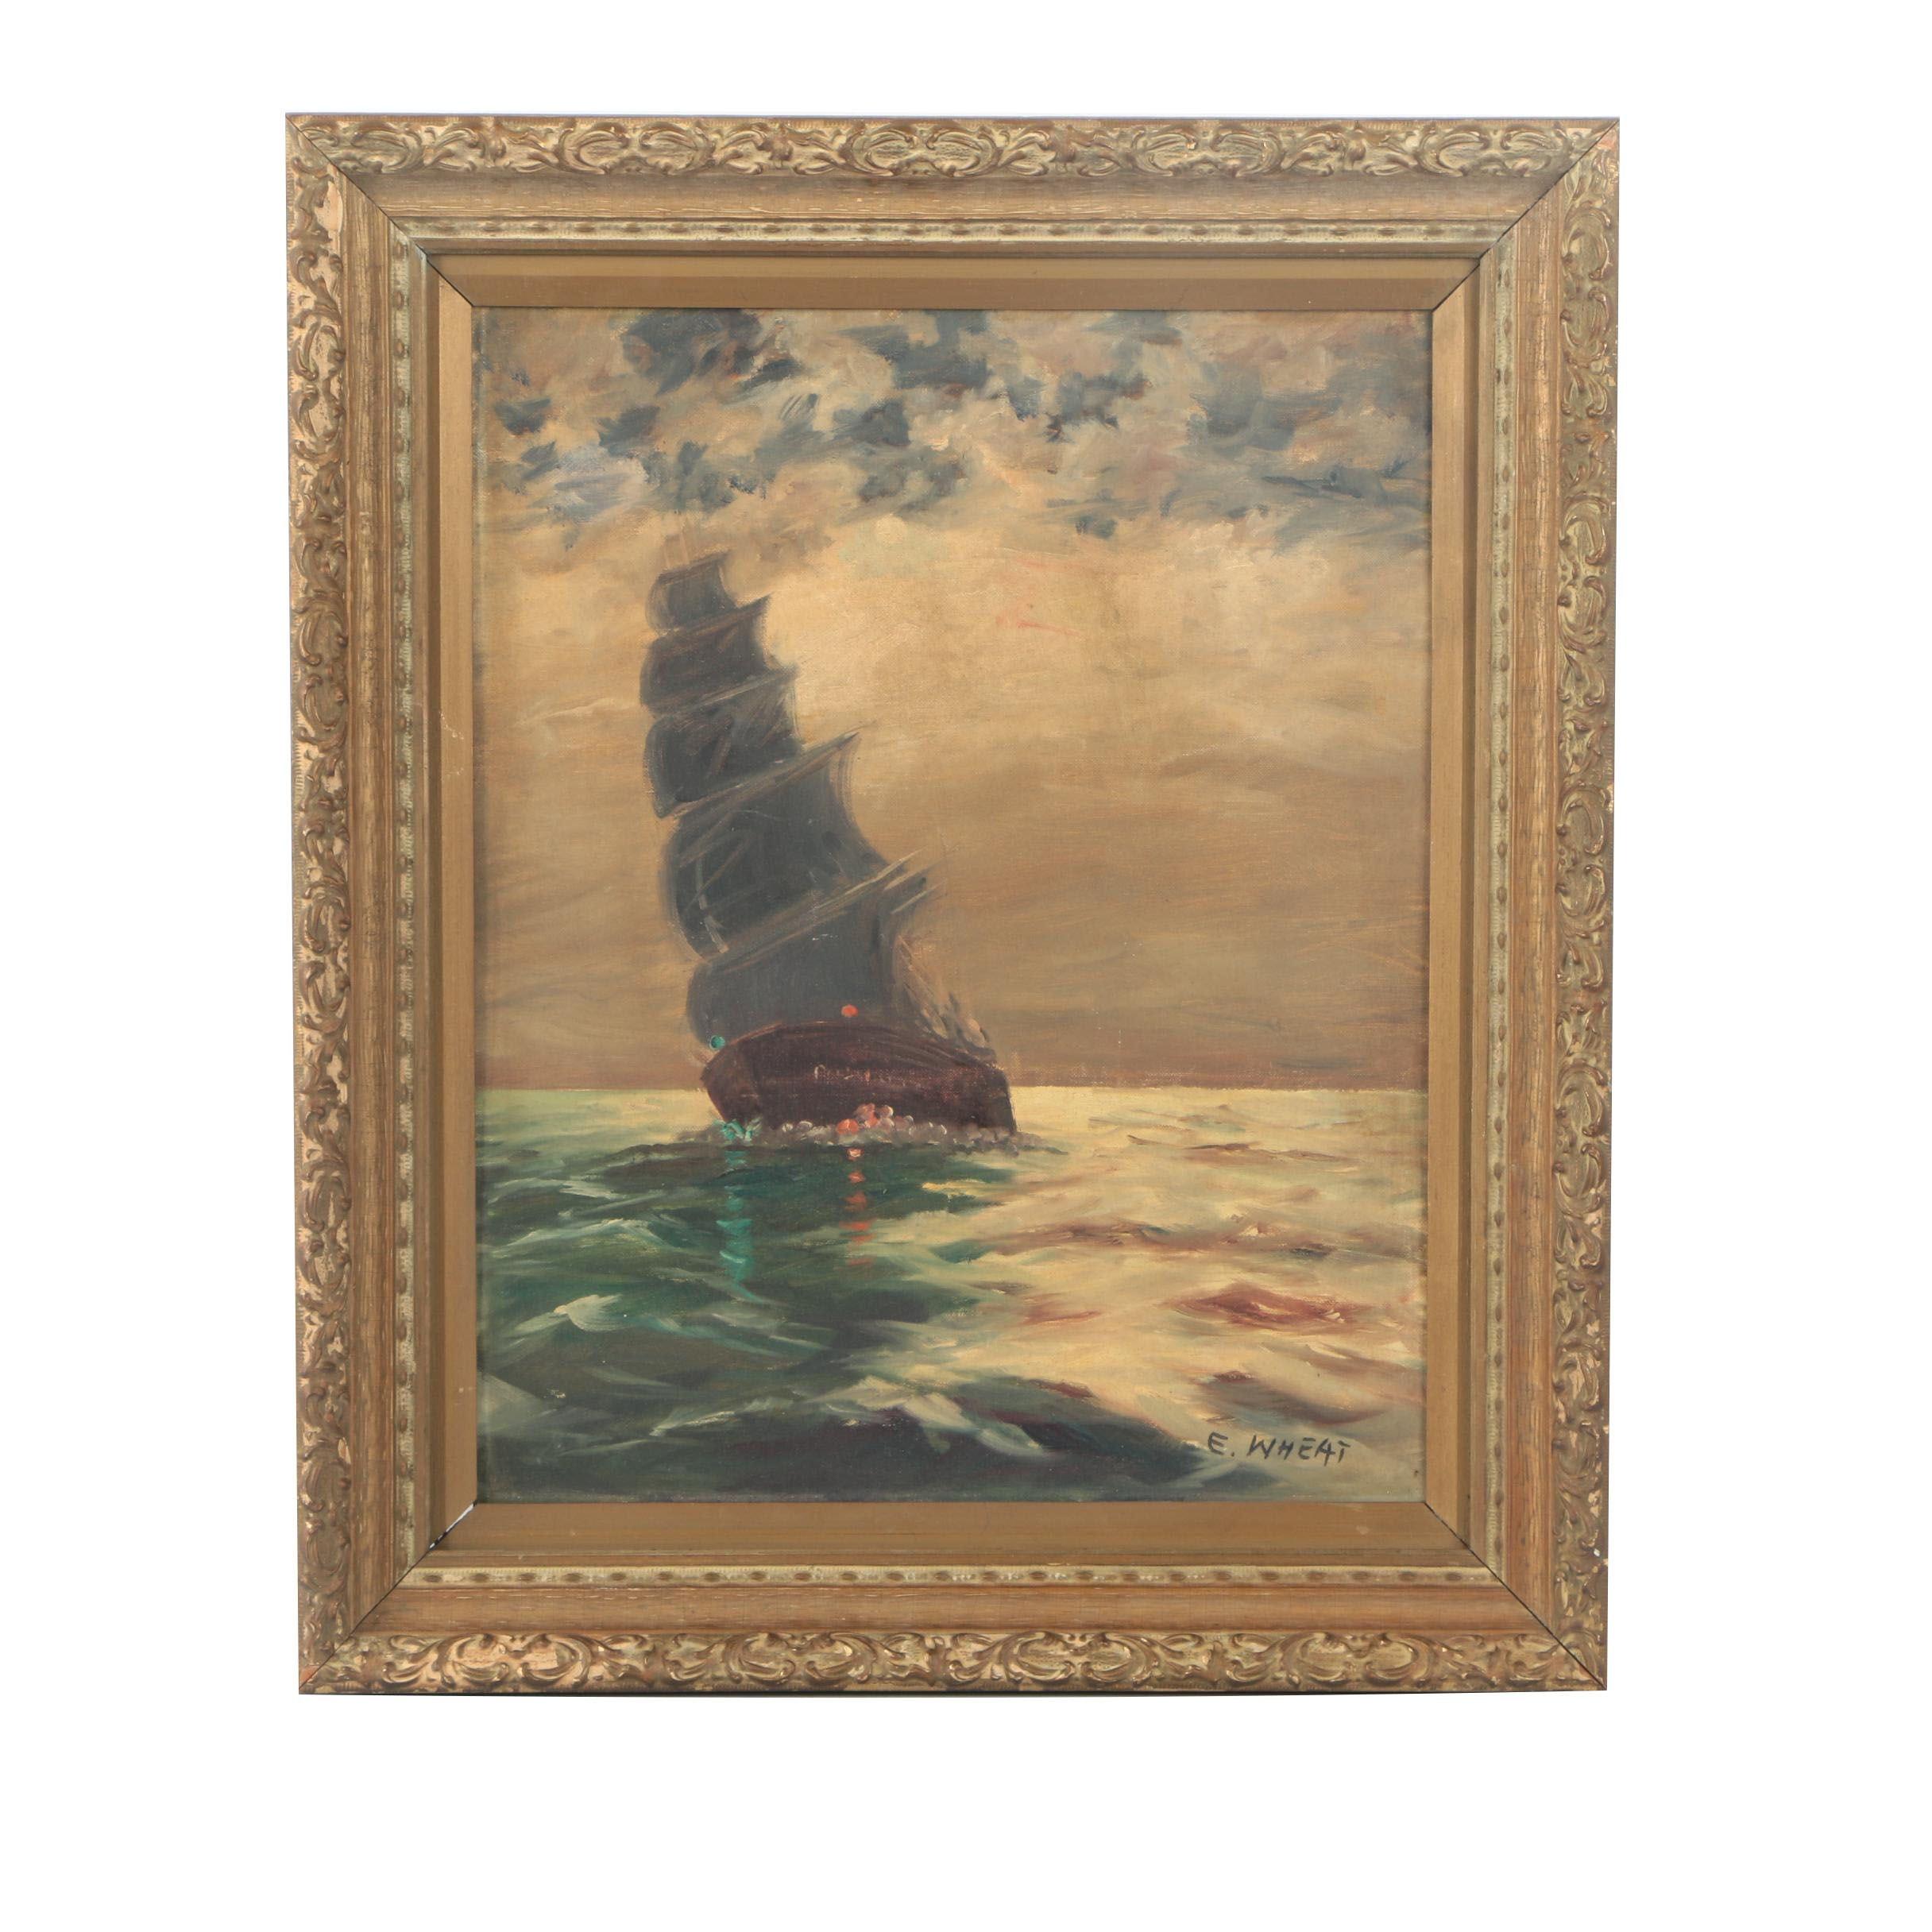 E. Wheat Oil Painting Ship at Sea